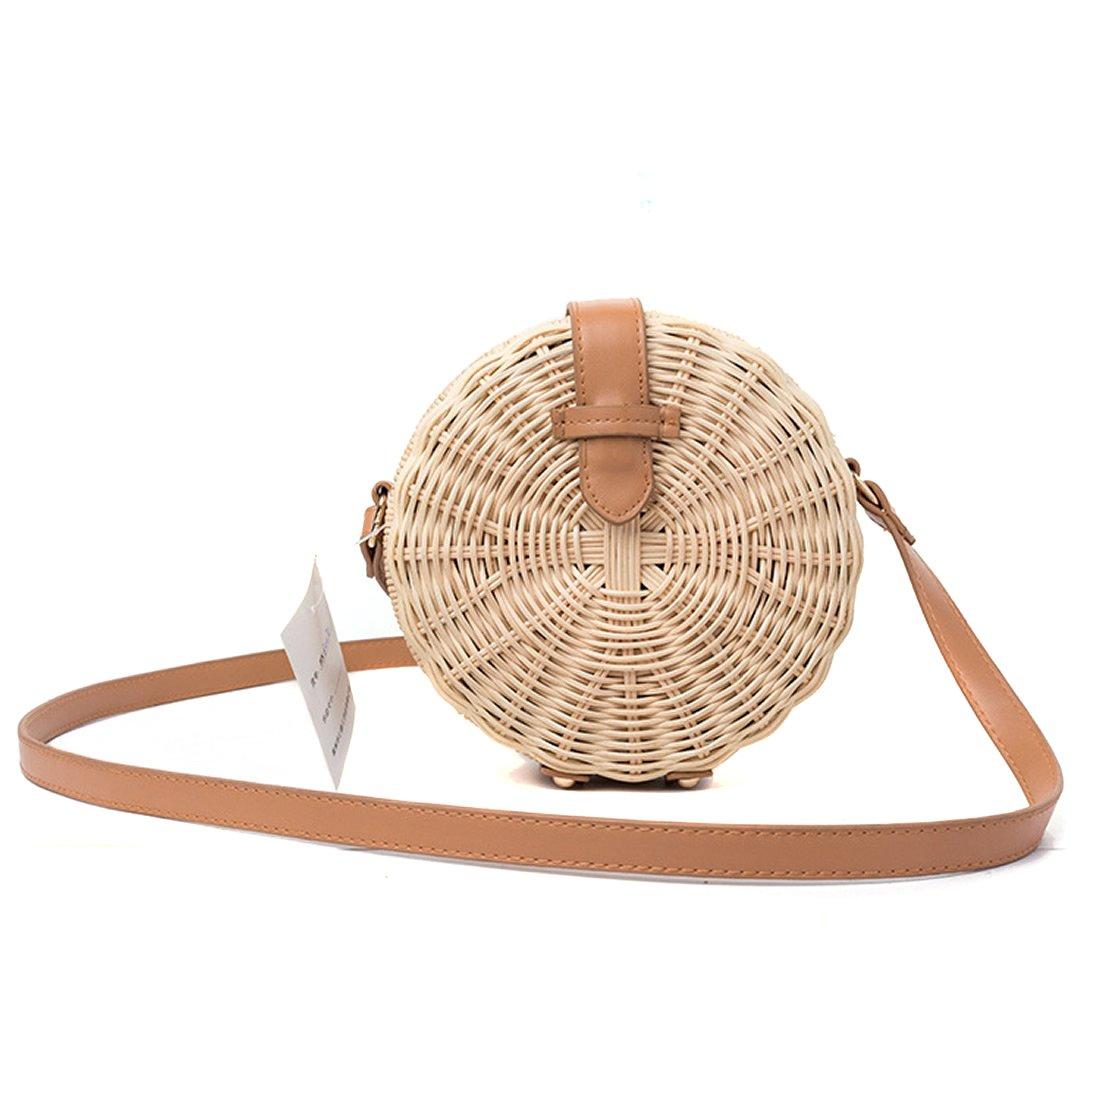 Round Straw Purse and Handbag Circle Rattan Ata Crossbody Bag Summer Beach Sea Shoulder Bag